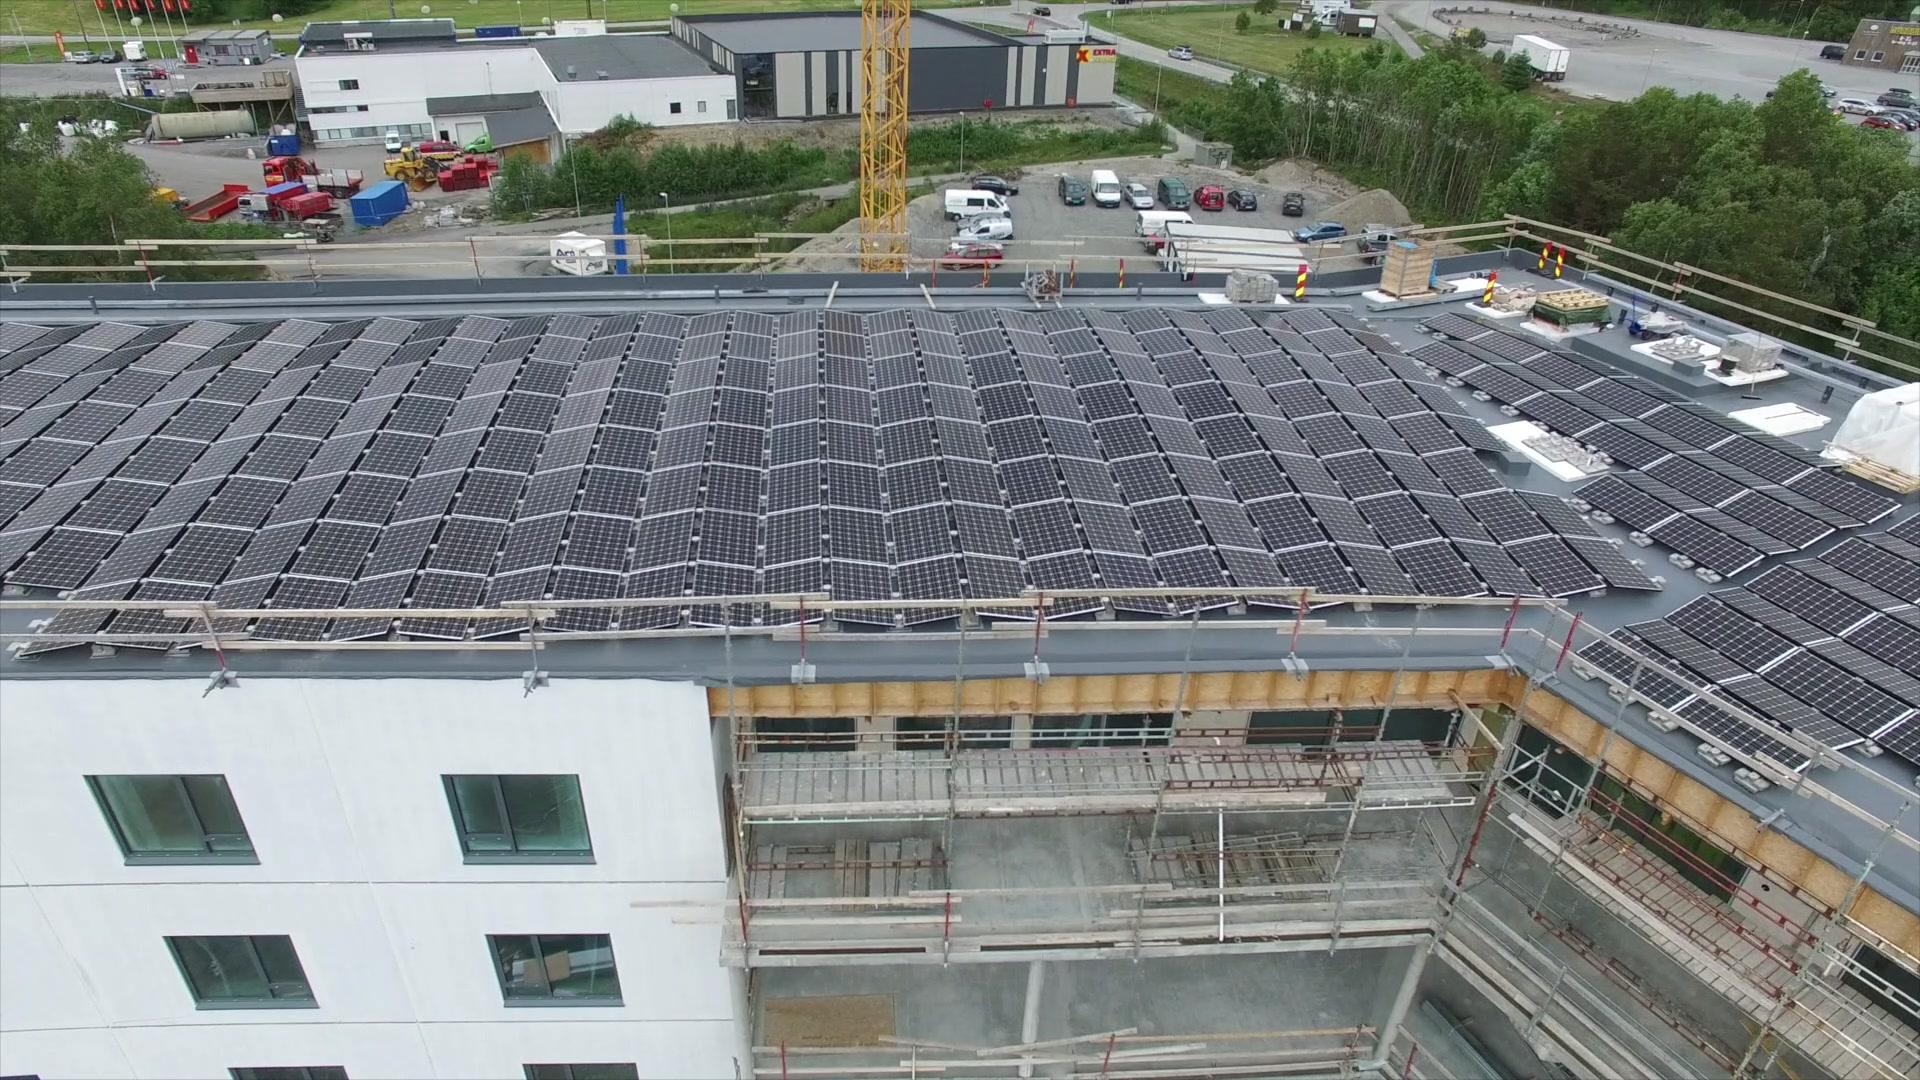 Skal samle solenergi p� taket